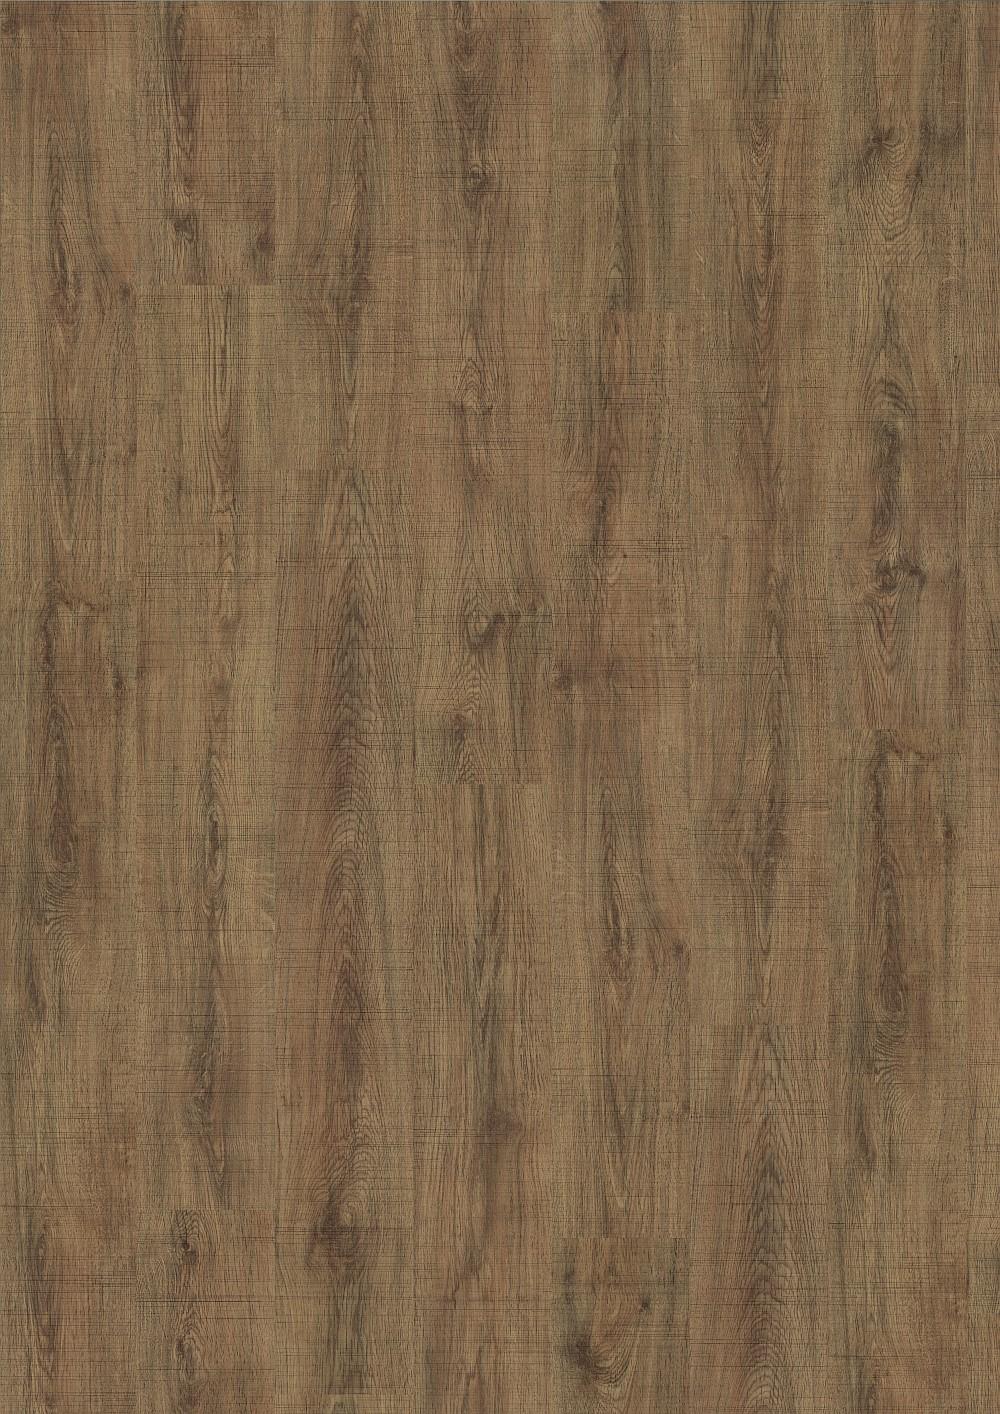 Korková plovoucí podlaha EGGER Cork+ Classic (Dub Madelana EGGER CO CL 2014)